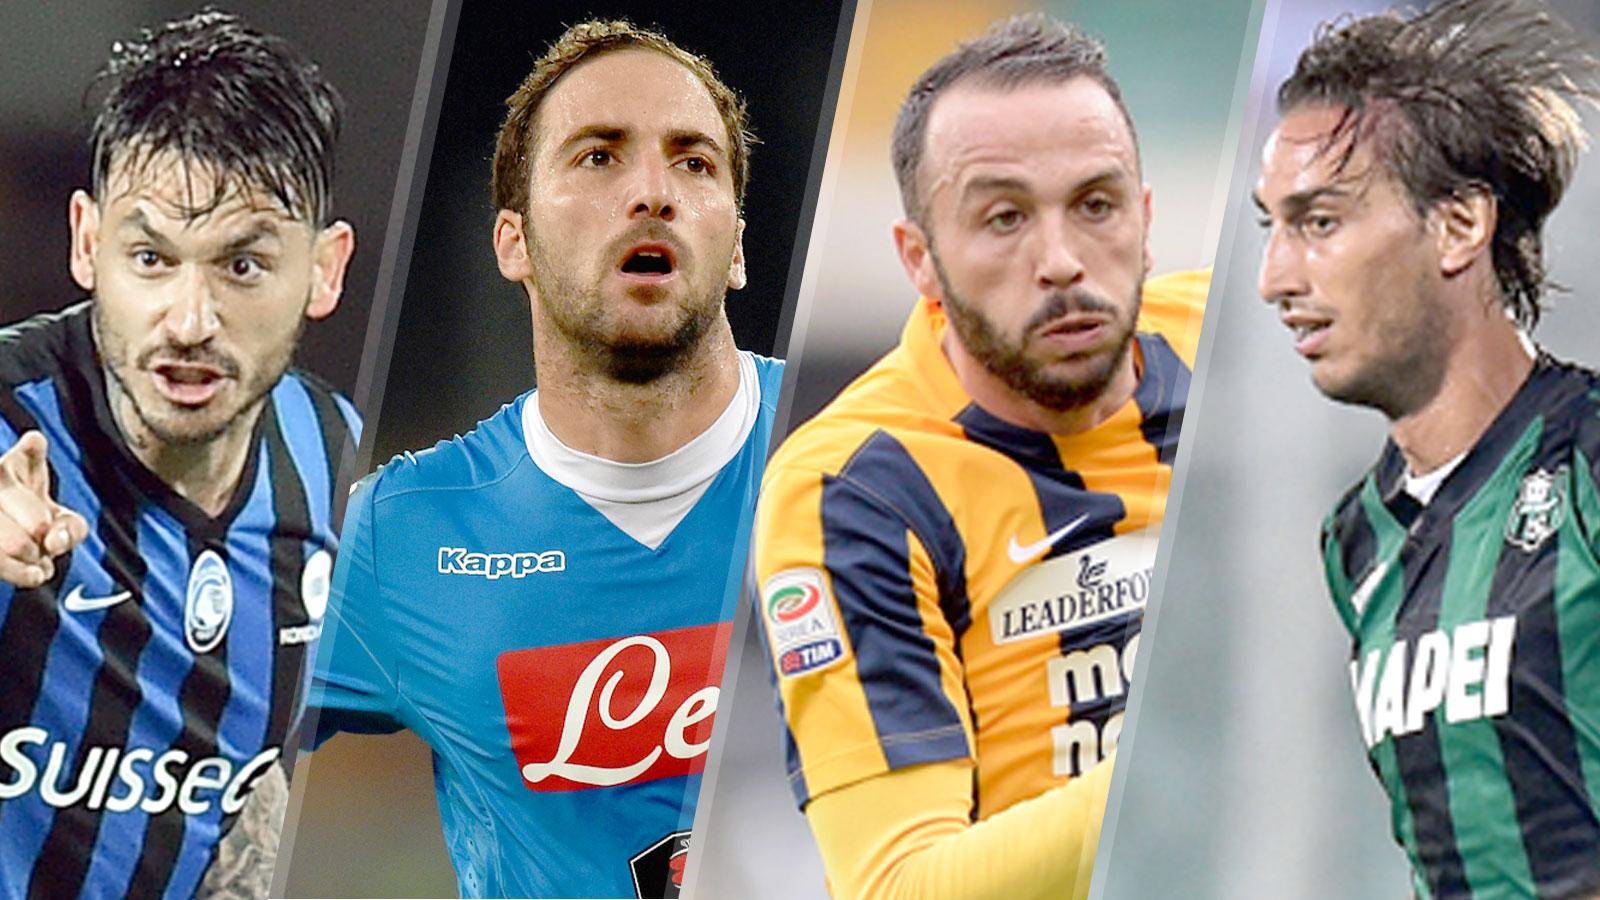 Live scores, updates: Atalanta, Verona, Napoli, Sassuolo in action